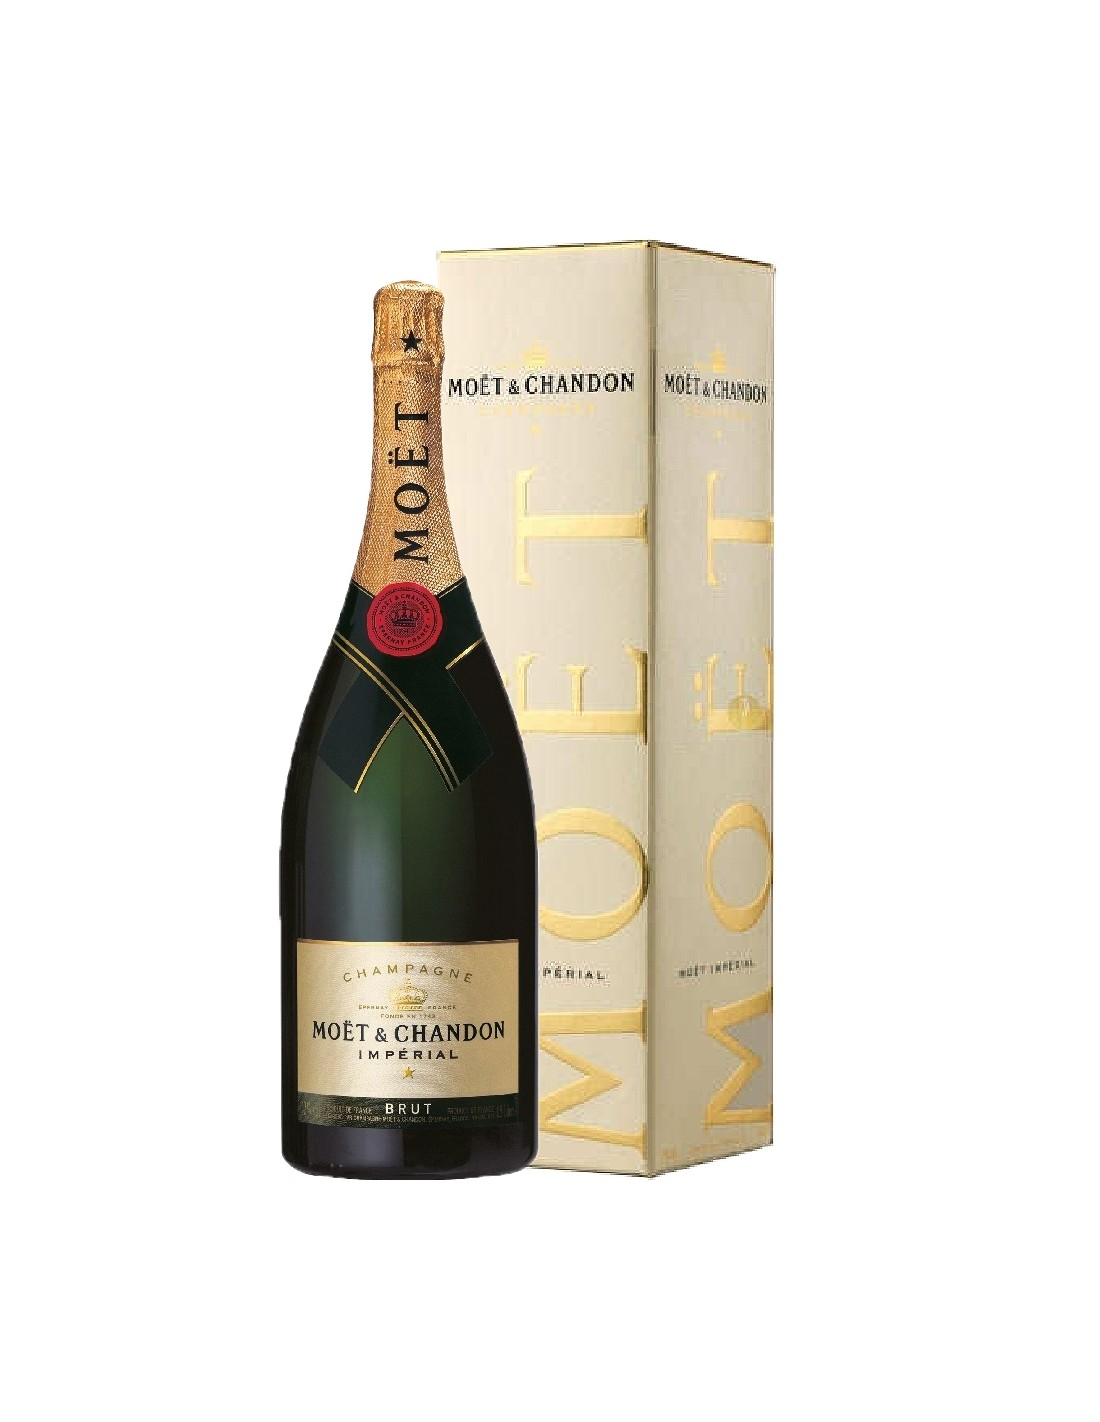 Sampanie Moët & Chandon Brut Imperial Champagne, 1.5L, 12% alc., Franta